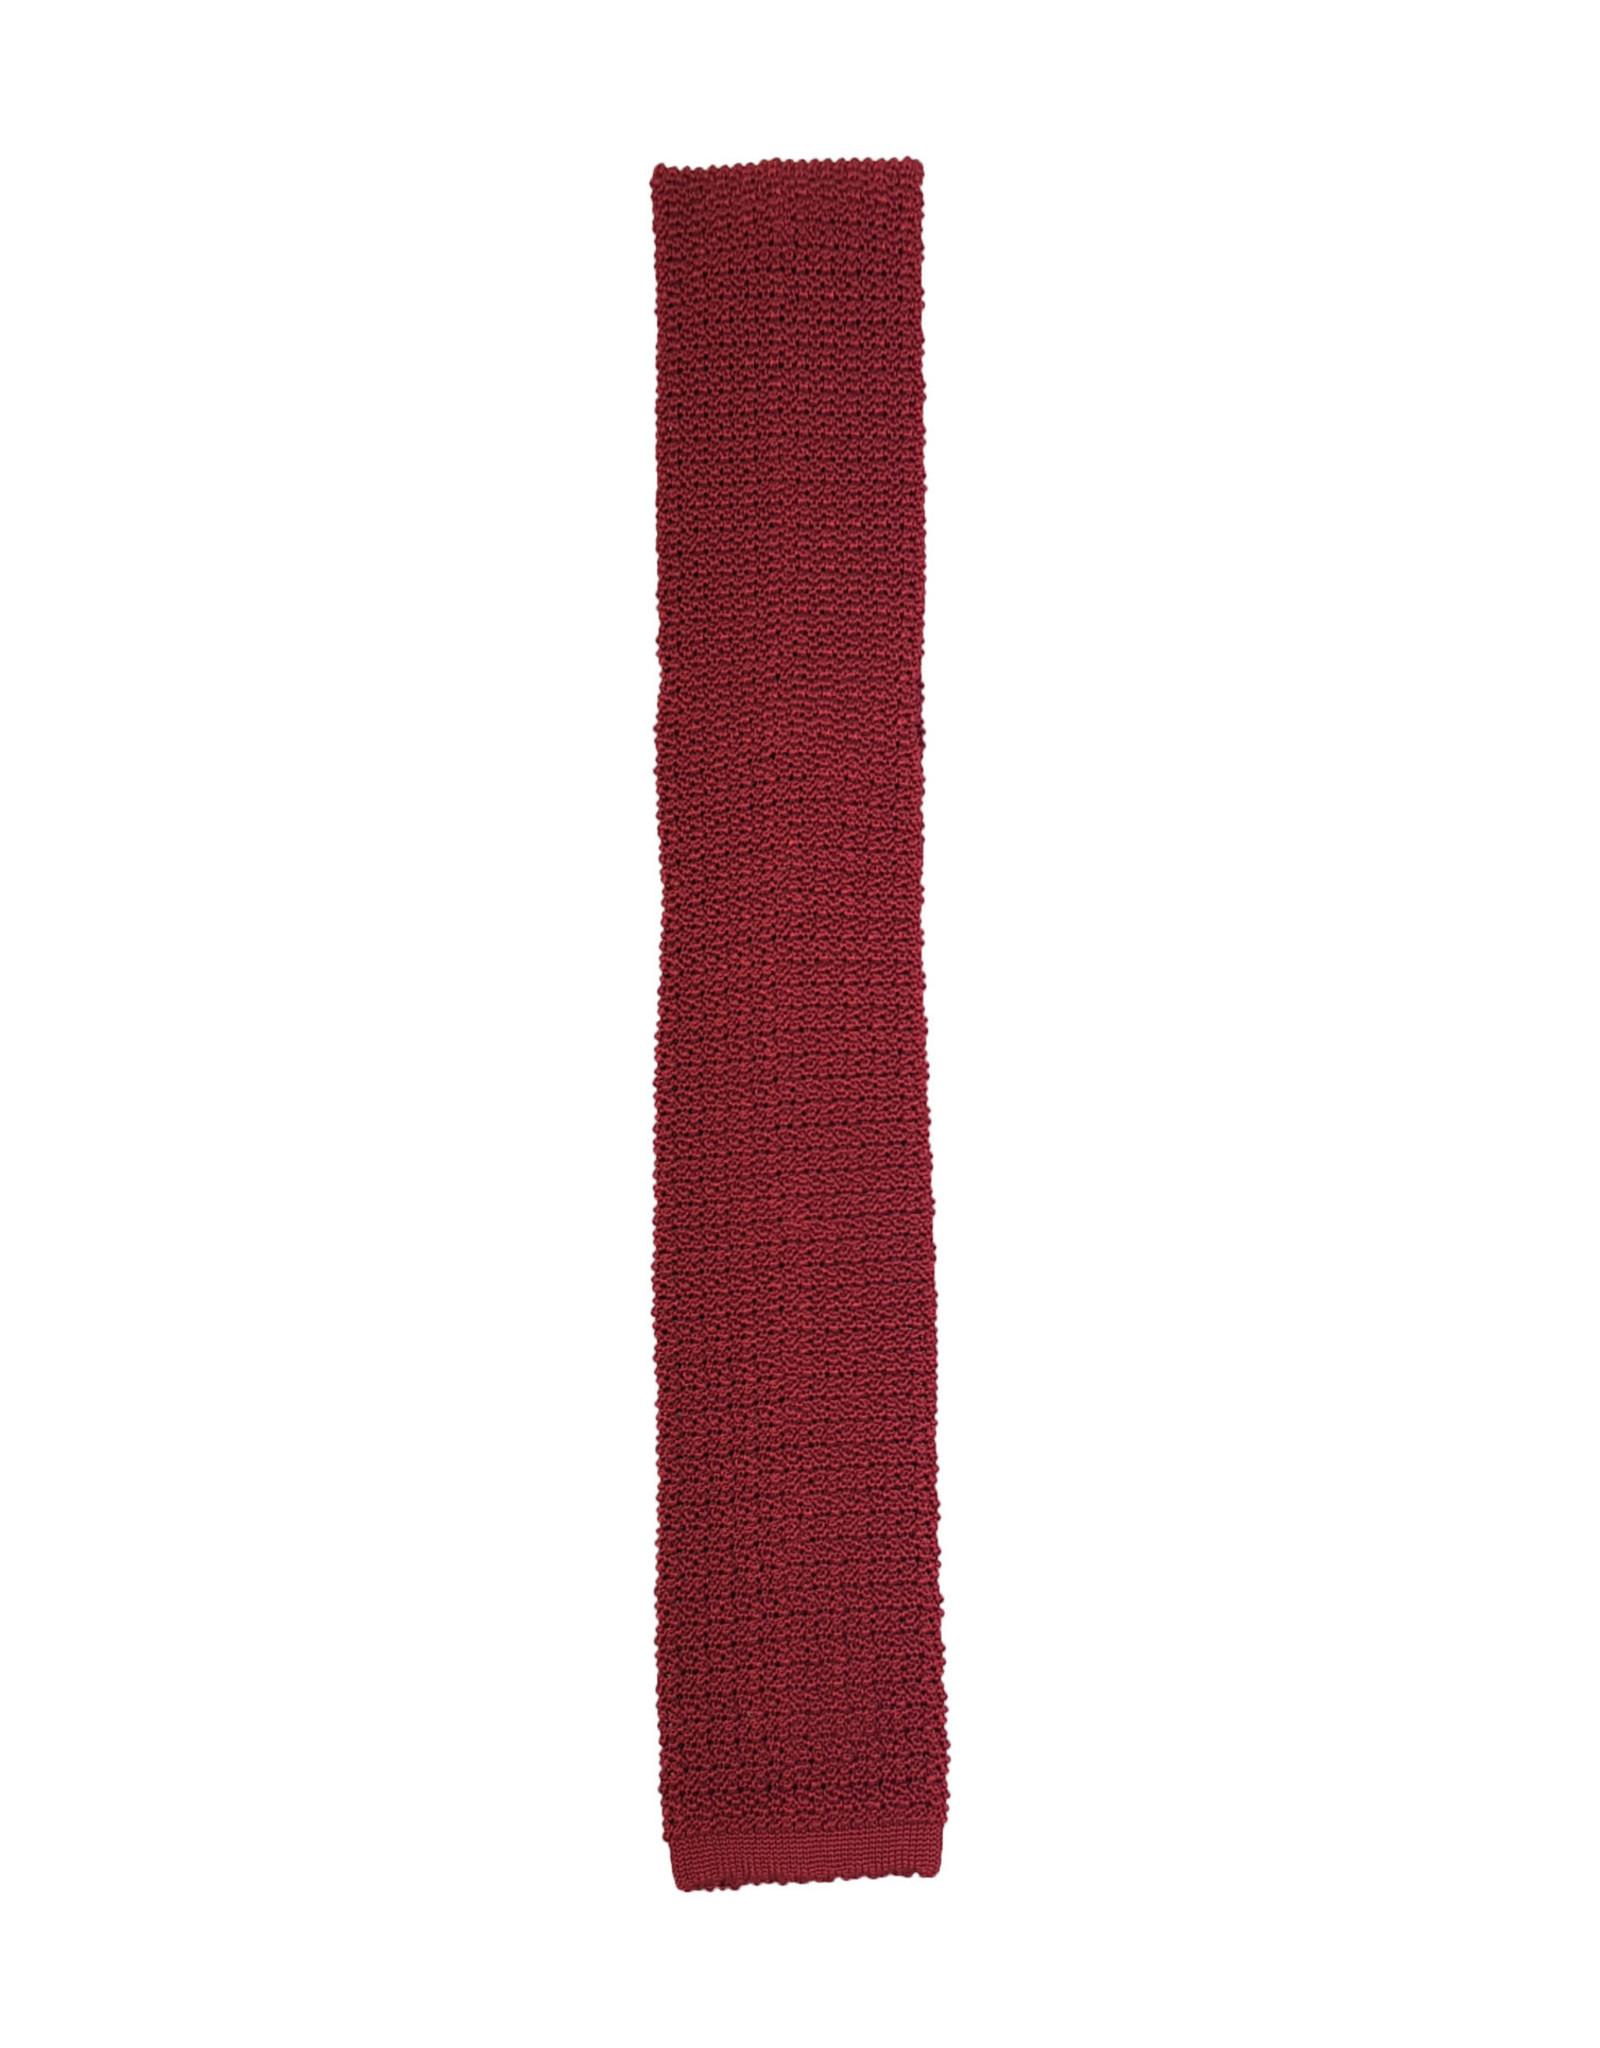 Ascot Sandmore's gebreide das rood 631502/8